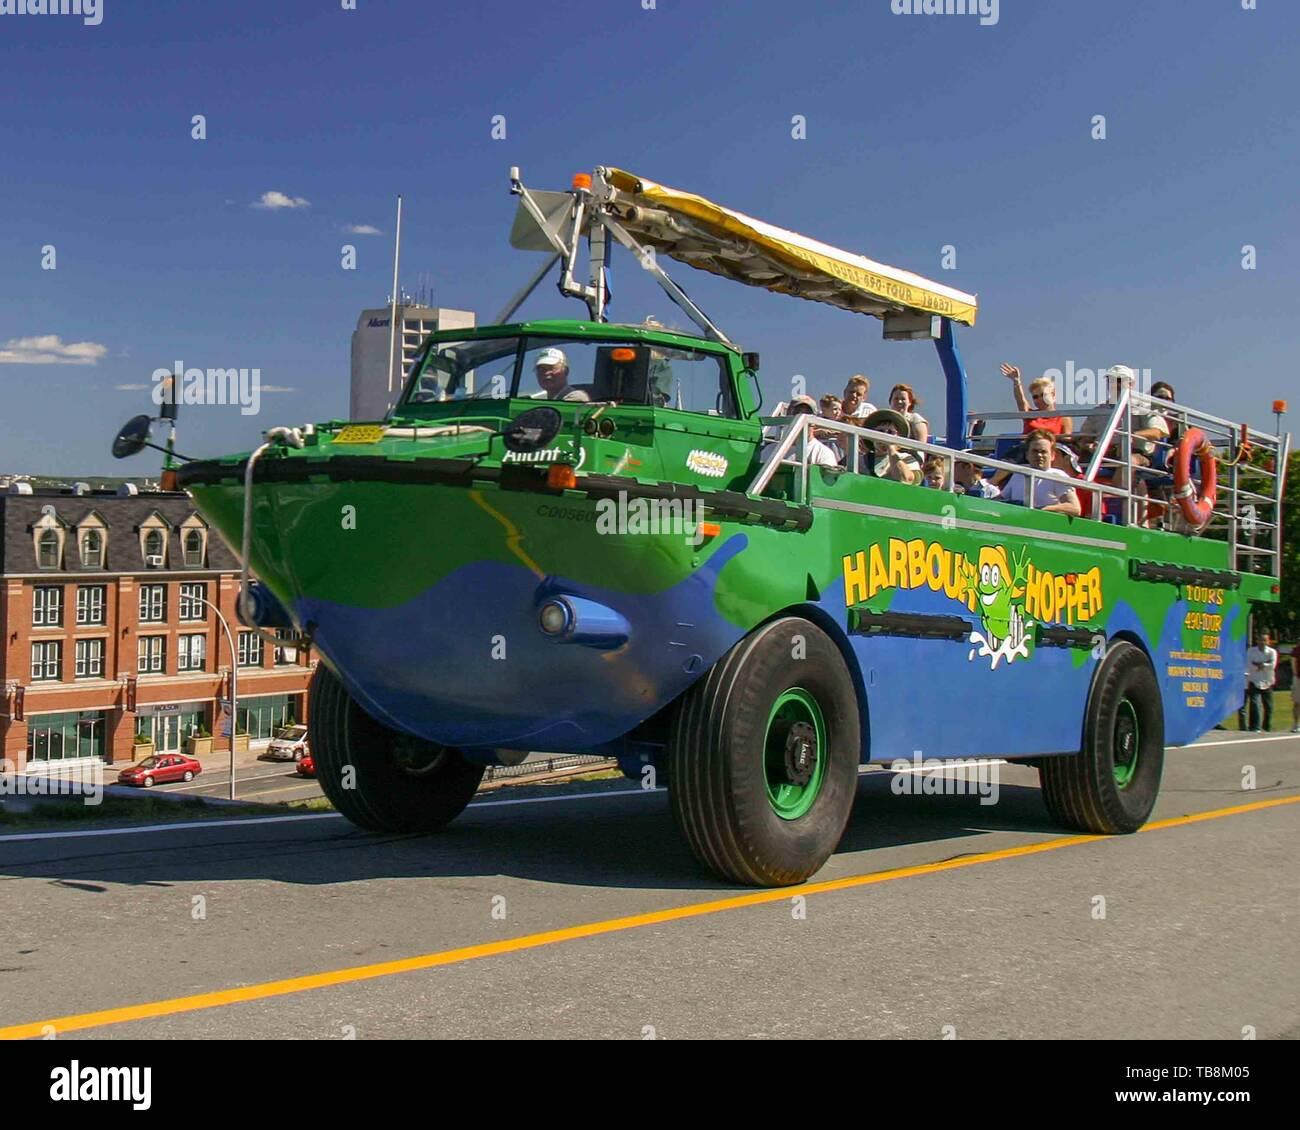 Halifax, Nova Scotia, Canada. 5th Sep, 2005. Harbor Hopper, an amphibious vehicle tour, takes tourists and visitors around the city of Halifax, Nova Scotia, and then into the harbor. Credit: Arnold Drapkin/ZUMA Wire/Alamy Live News - Stock Image